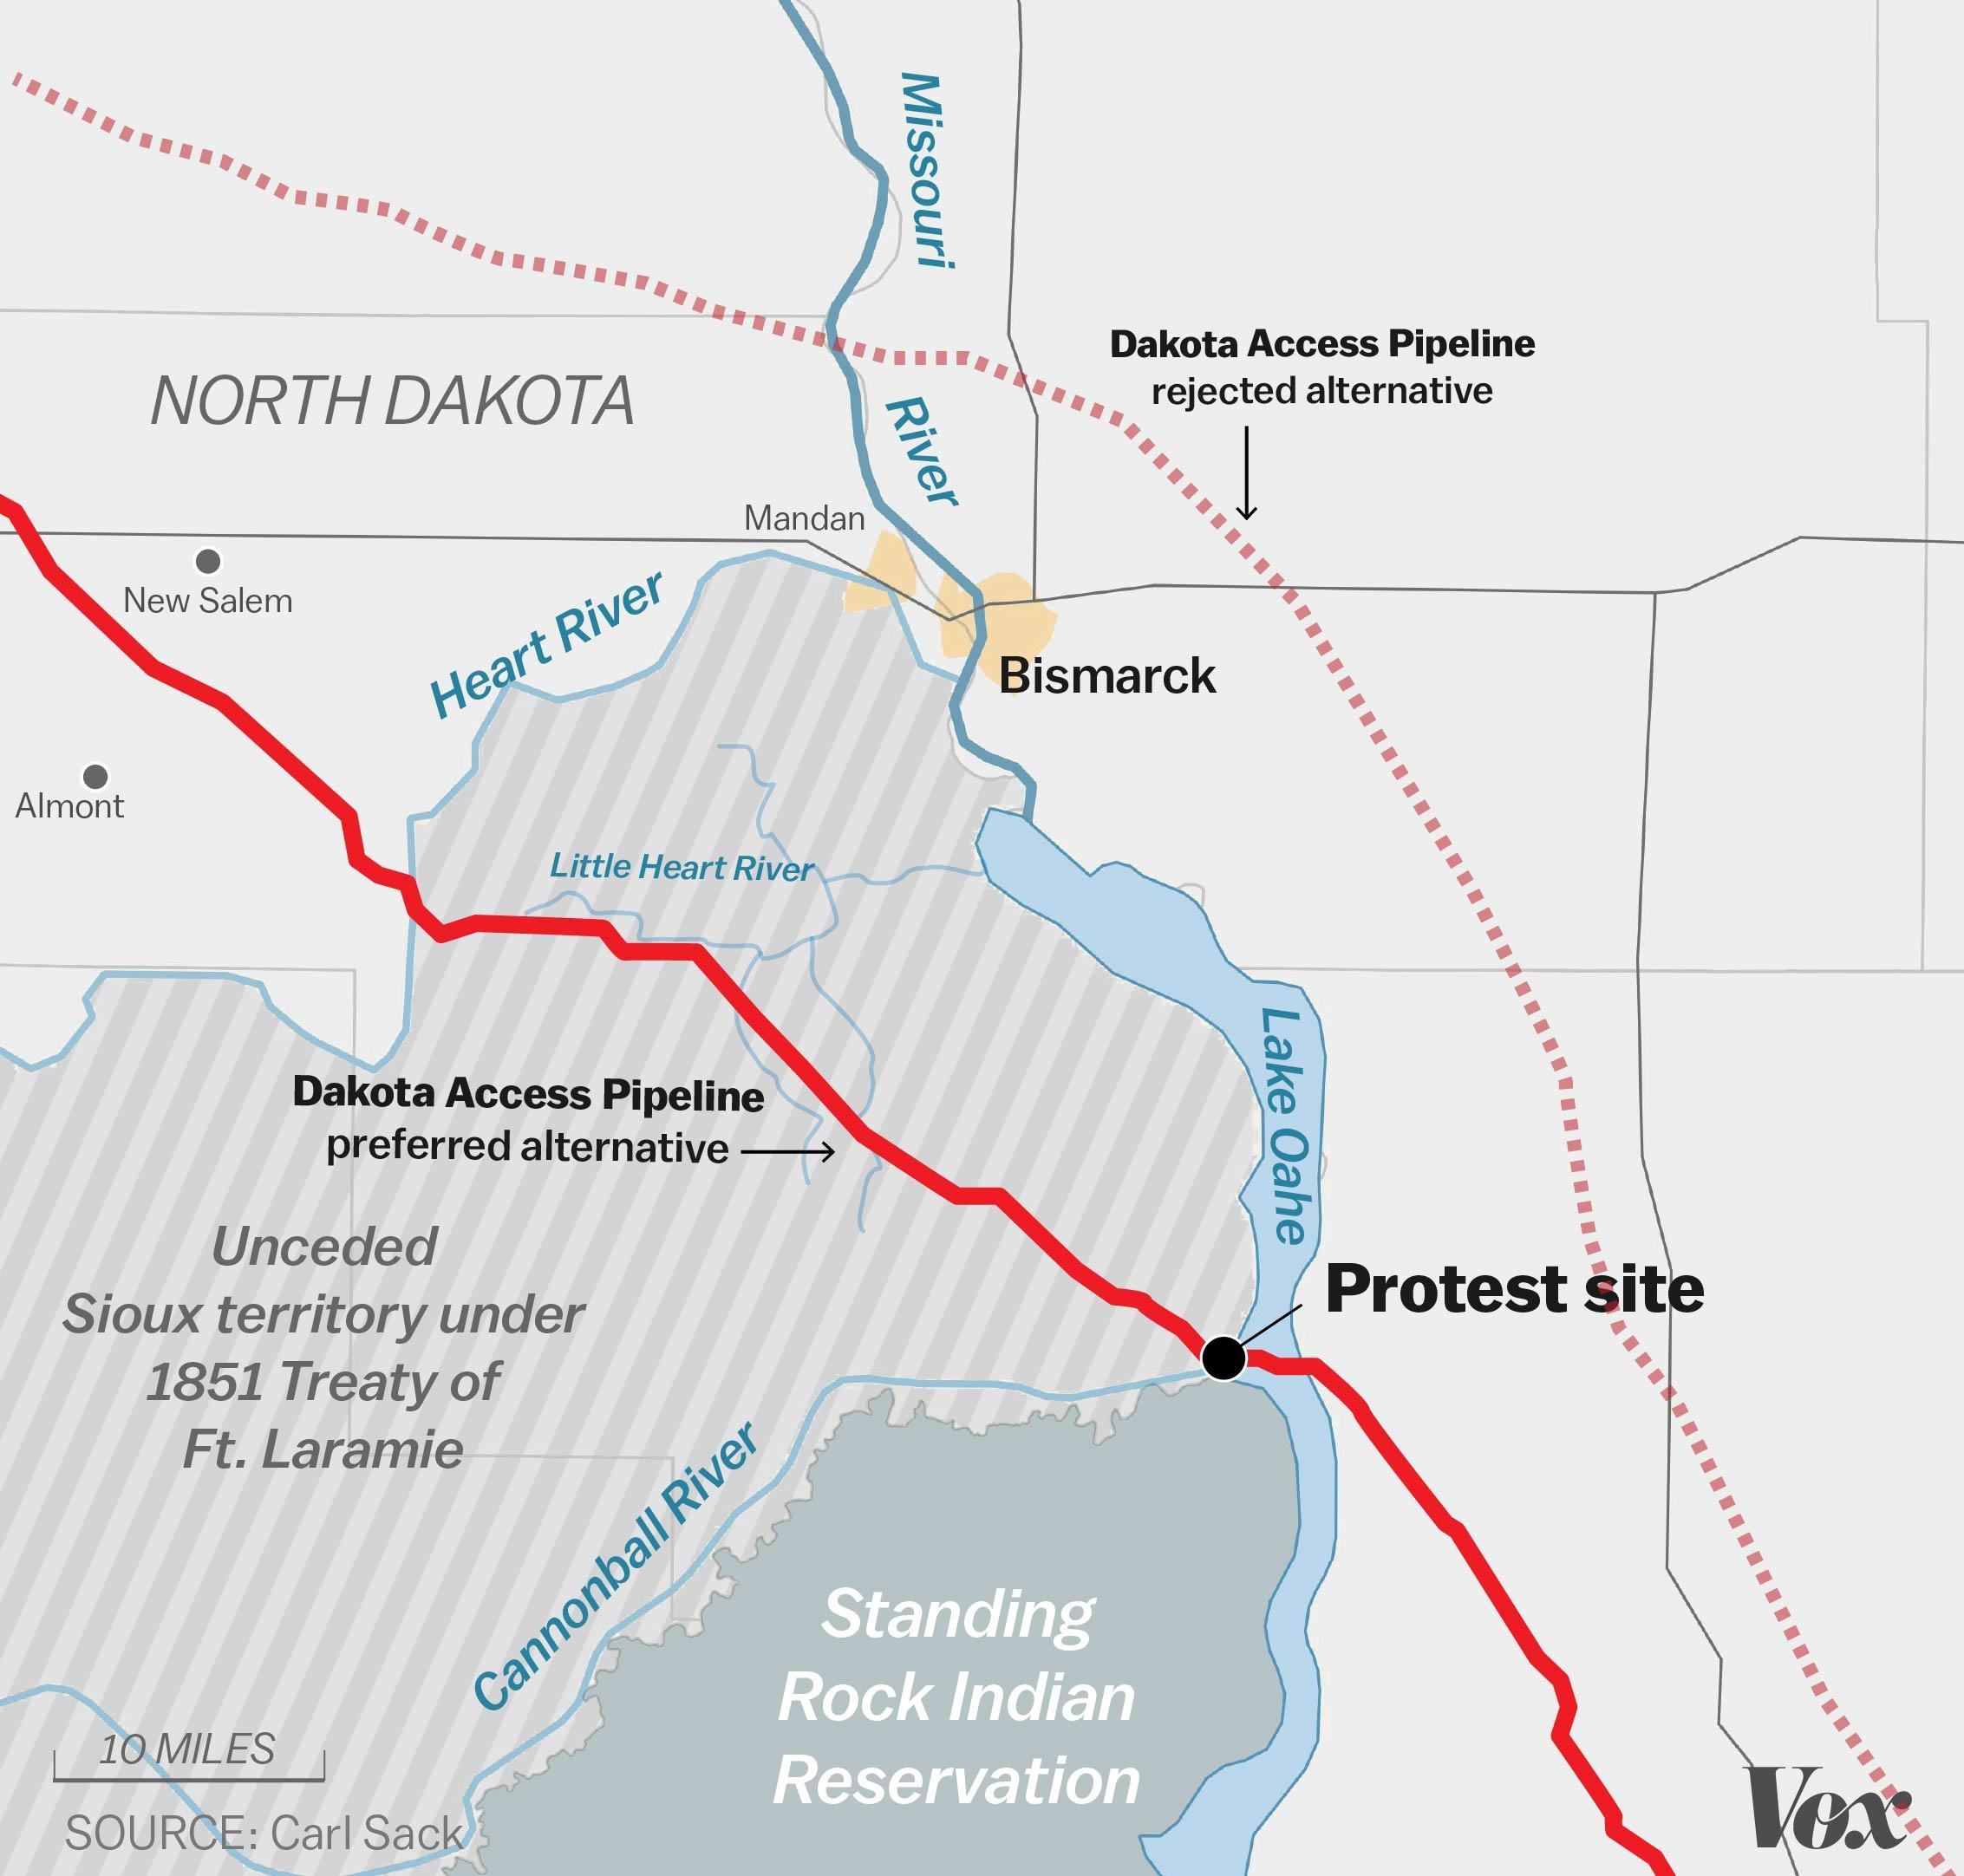 Dakota Access Pipeline Iowa Map.Army Corps Says It Will Consider Alternative Routes For The Dakota